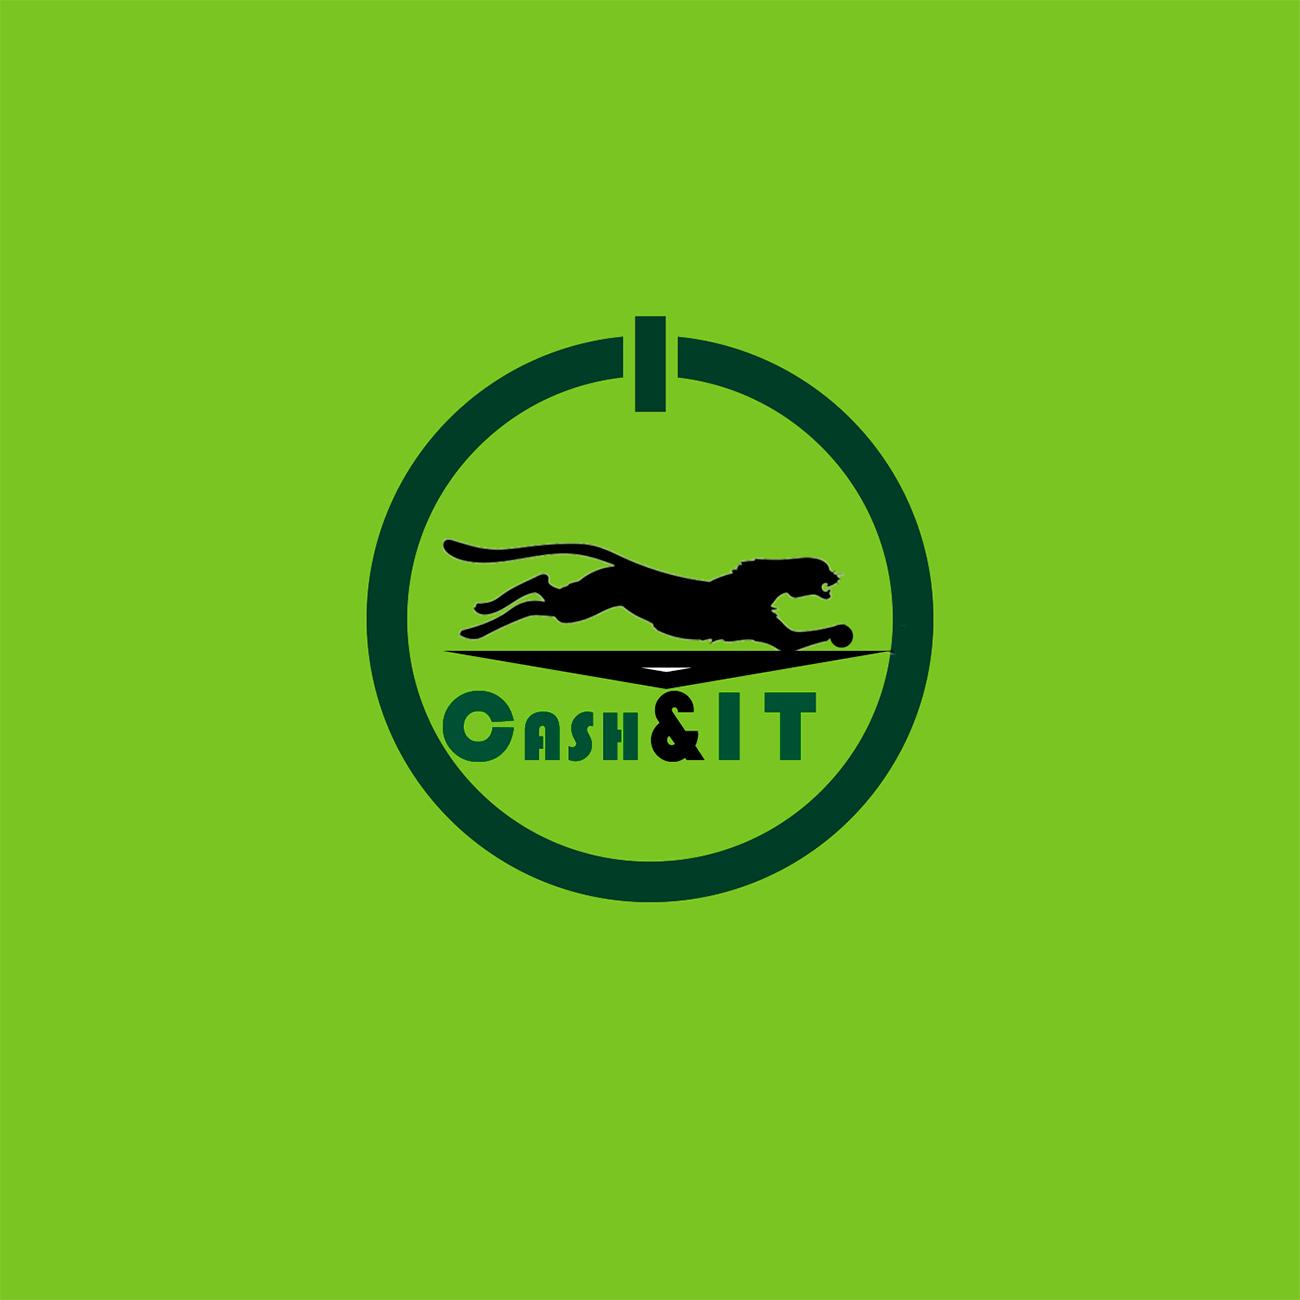 Логотип для Cash & IT - сервис доставки денег фото f_8295fdf6a598e042.jpg